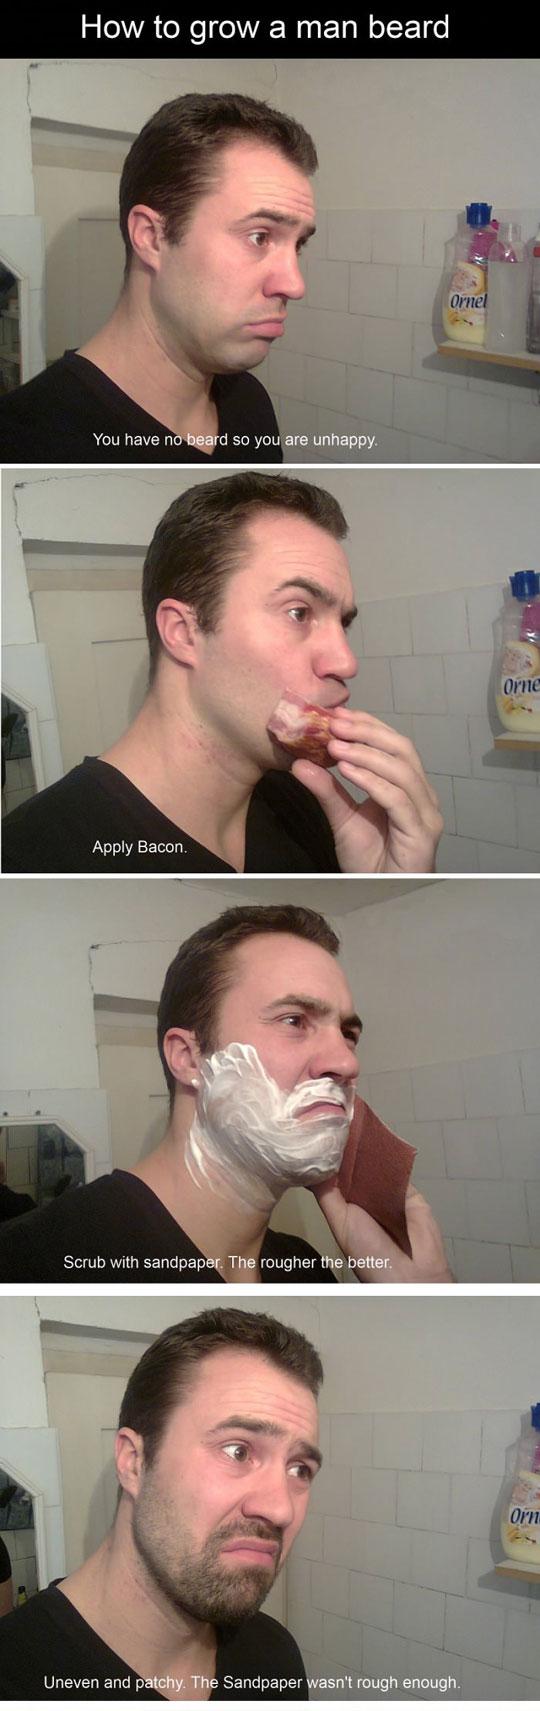 How to grow a man beard...